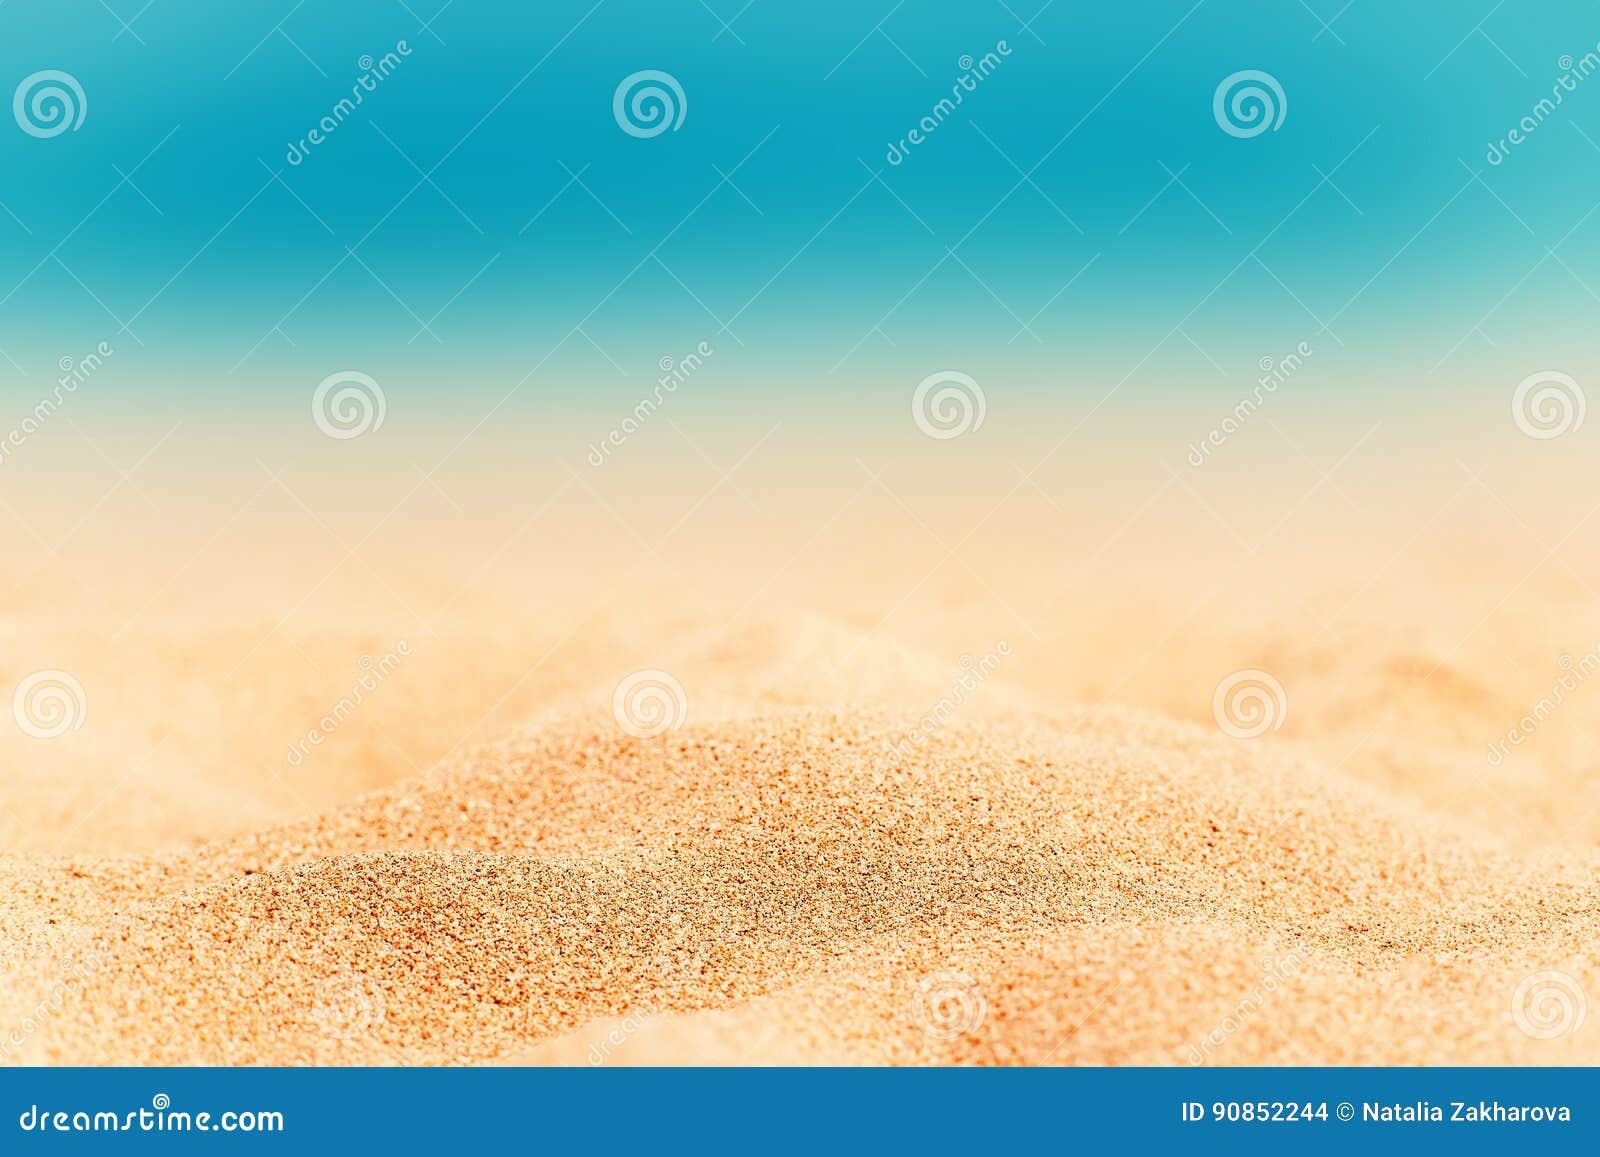 De zomerachtergrond - Sunny Beach met gouden zand